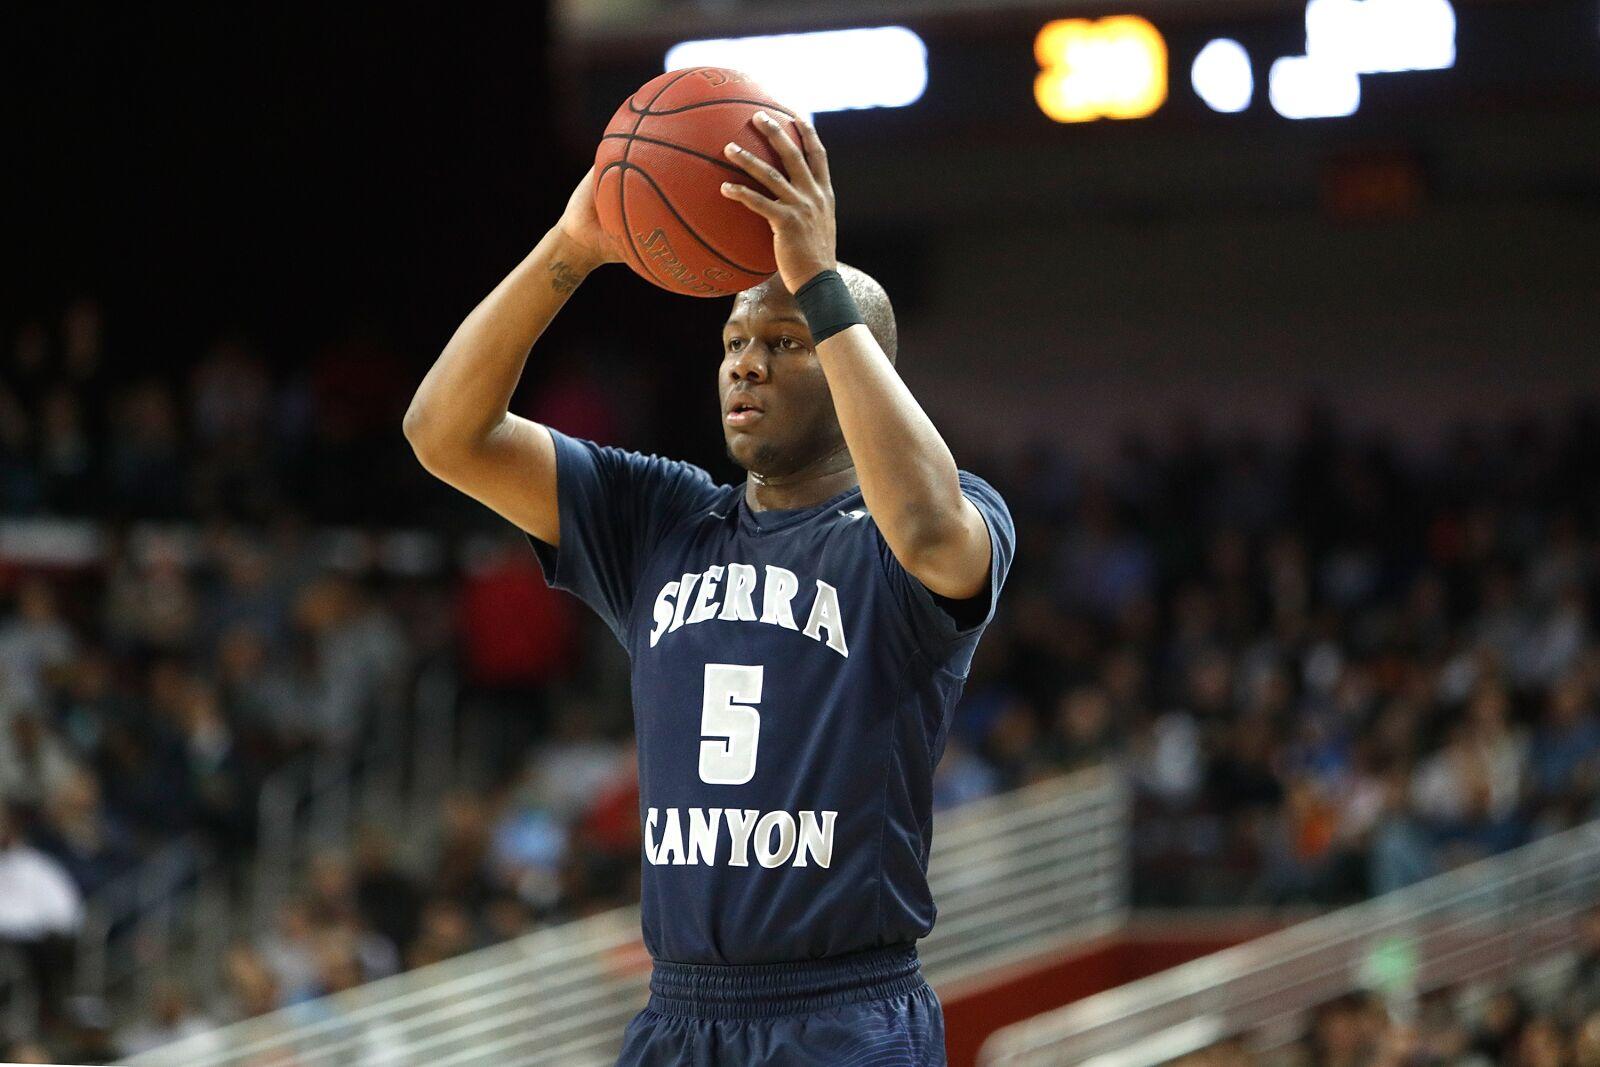 NCAA Basketball Recruiting: Star-studded Sierra Canyon's